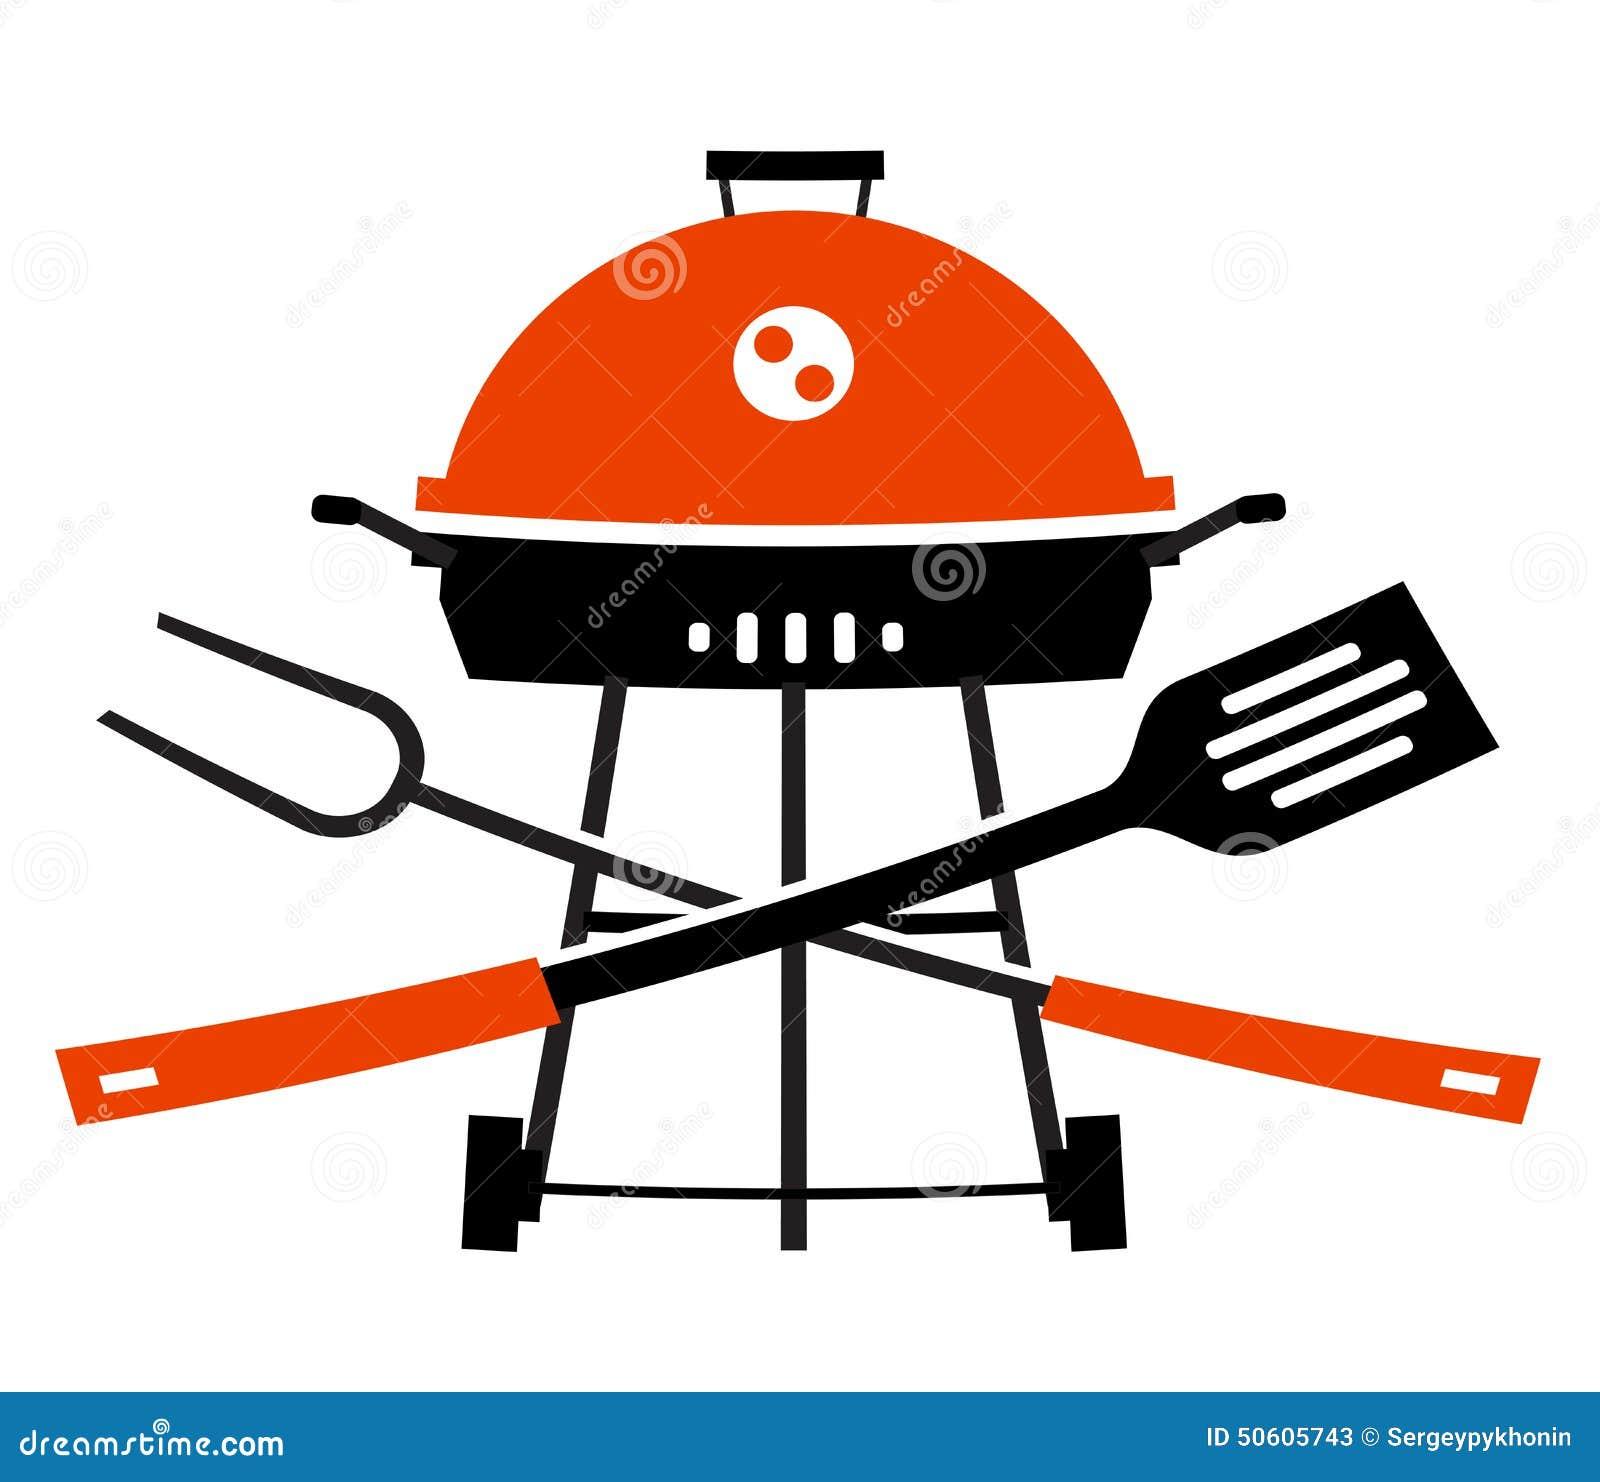 Grill, grill, grill, pinkin naczynia dla